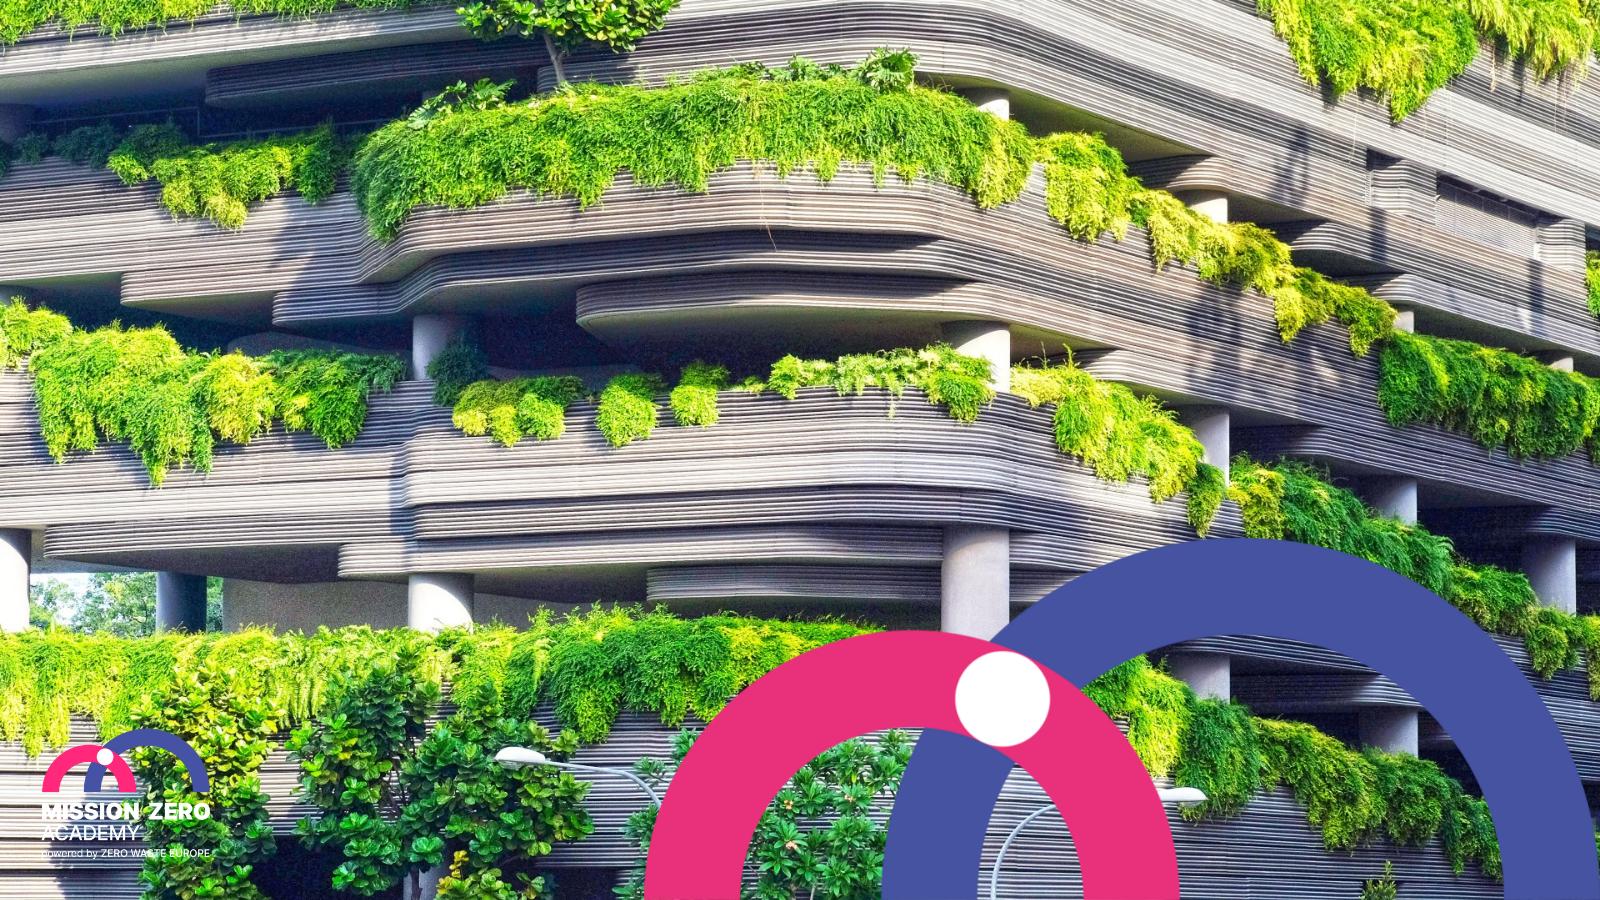 Zero-waste-zero-emissions